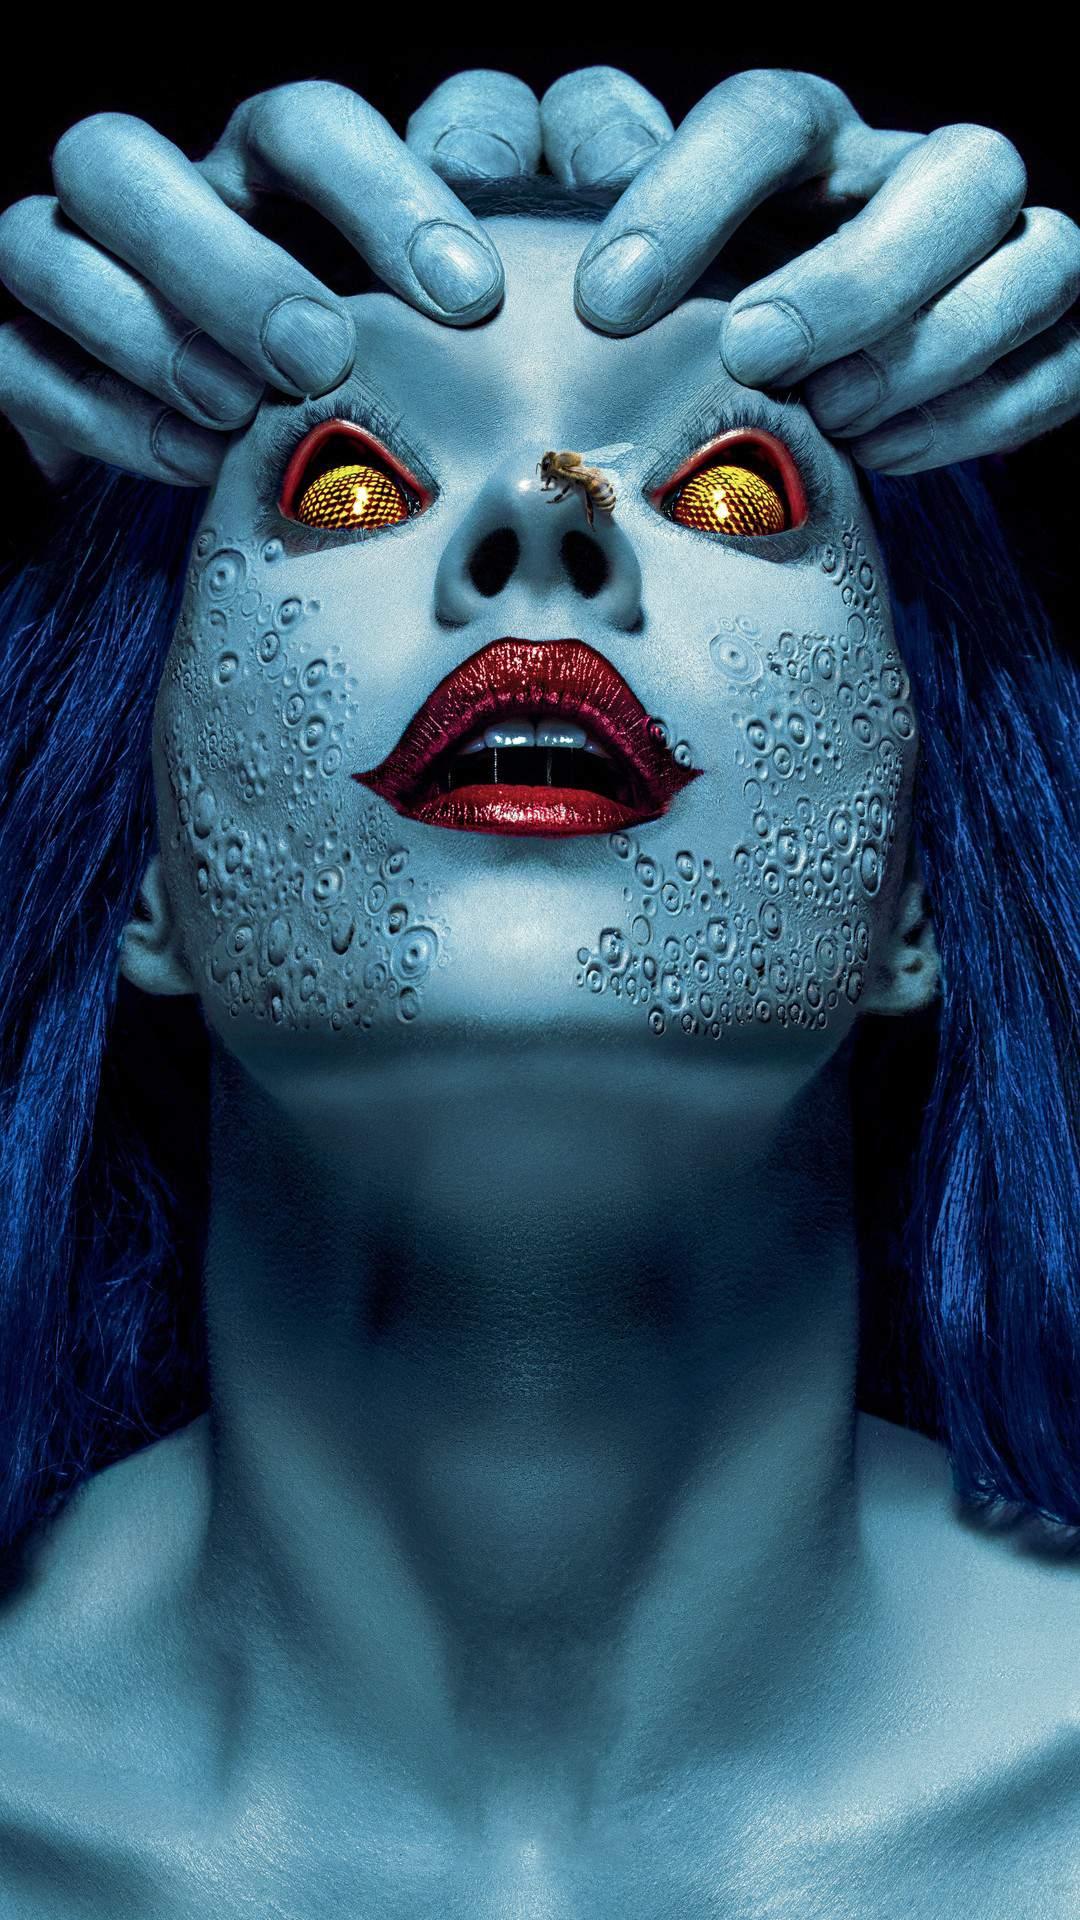 American horror story Halloween iPhone Wallpaper